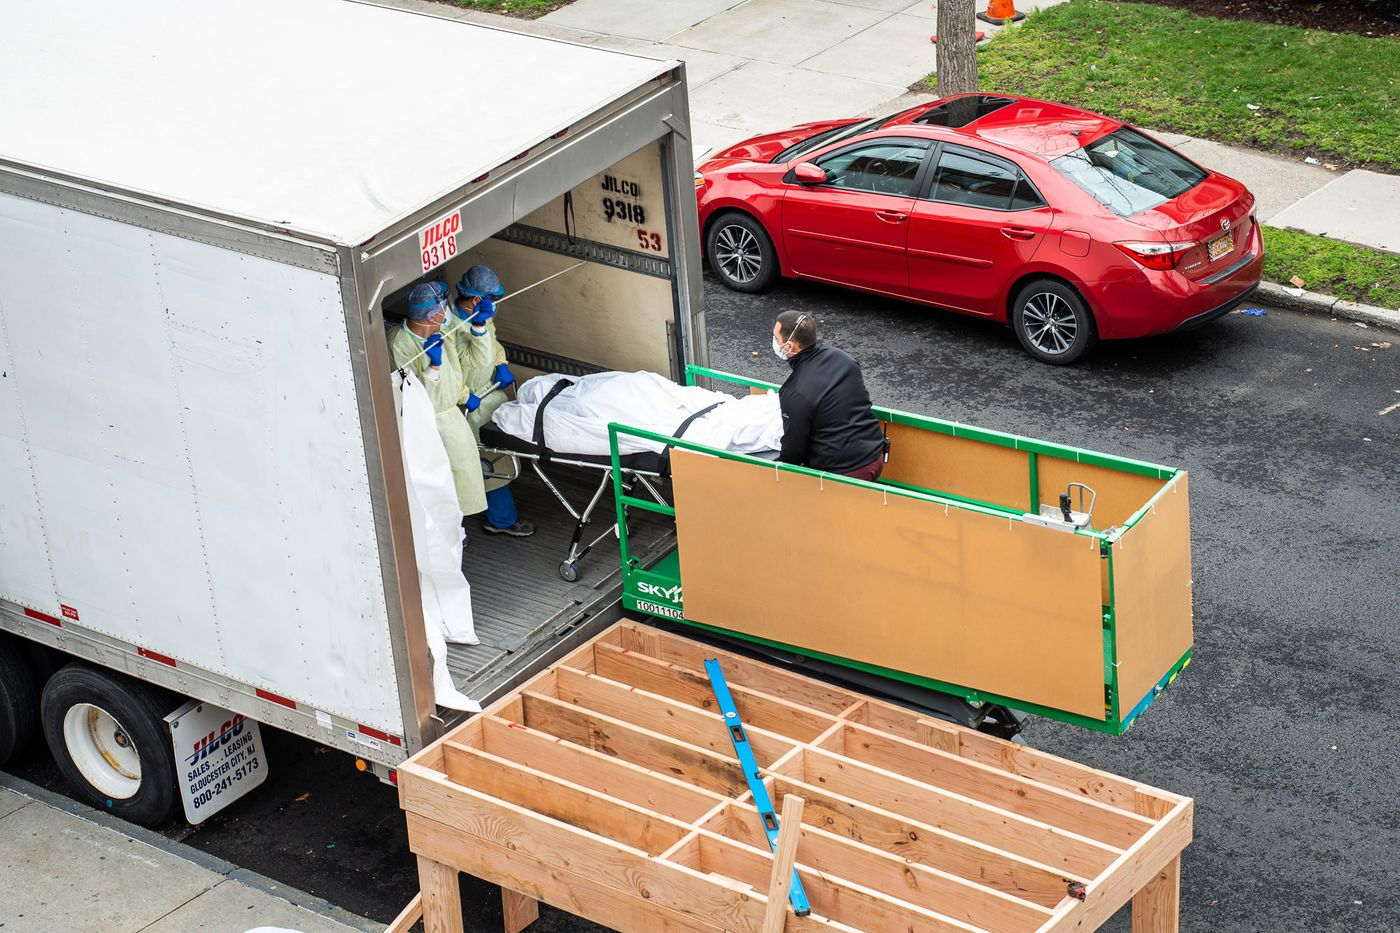 A NYC Hospital CMO on Refrigerated Trucks for Coronavirus